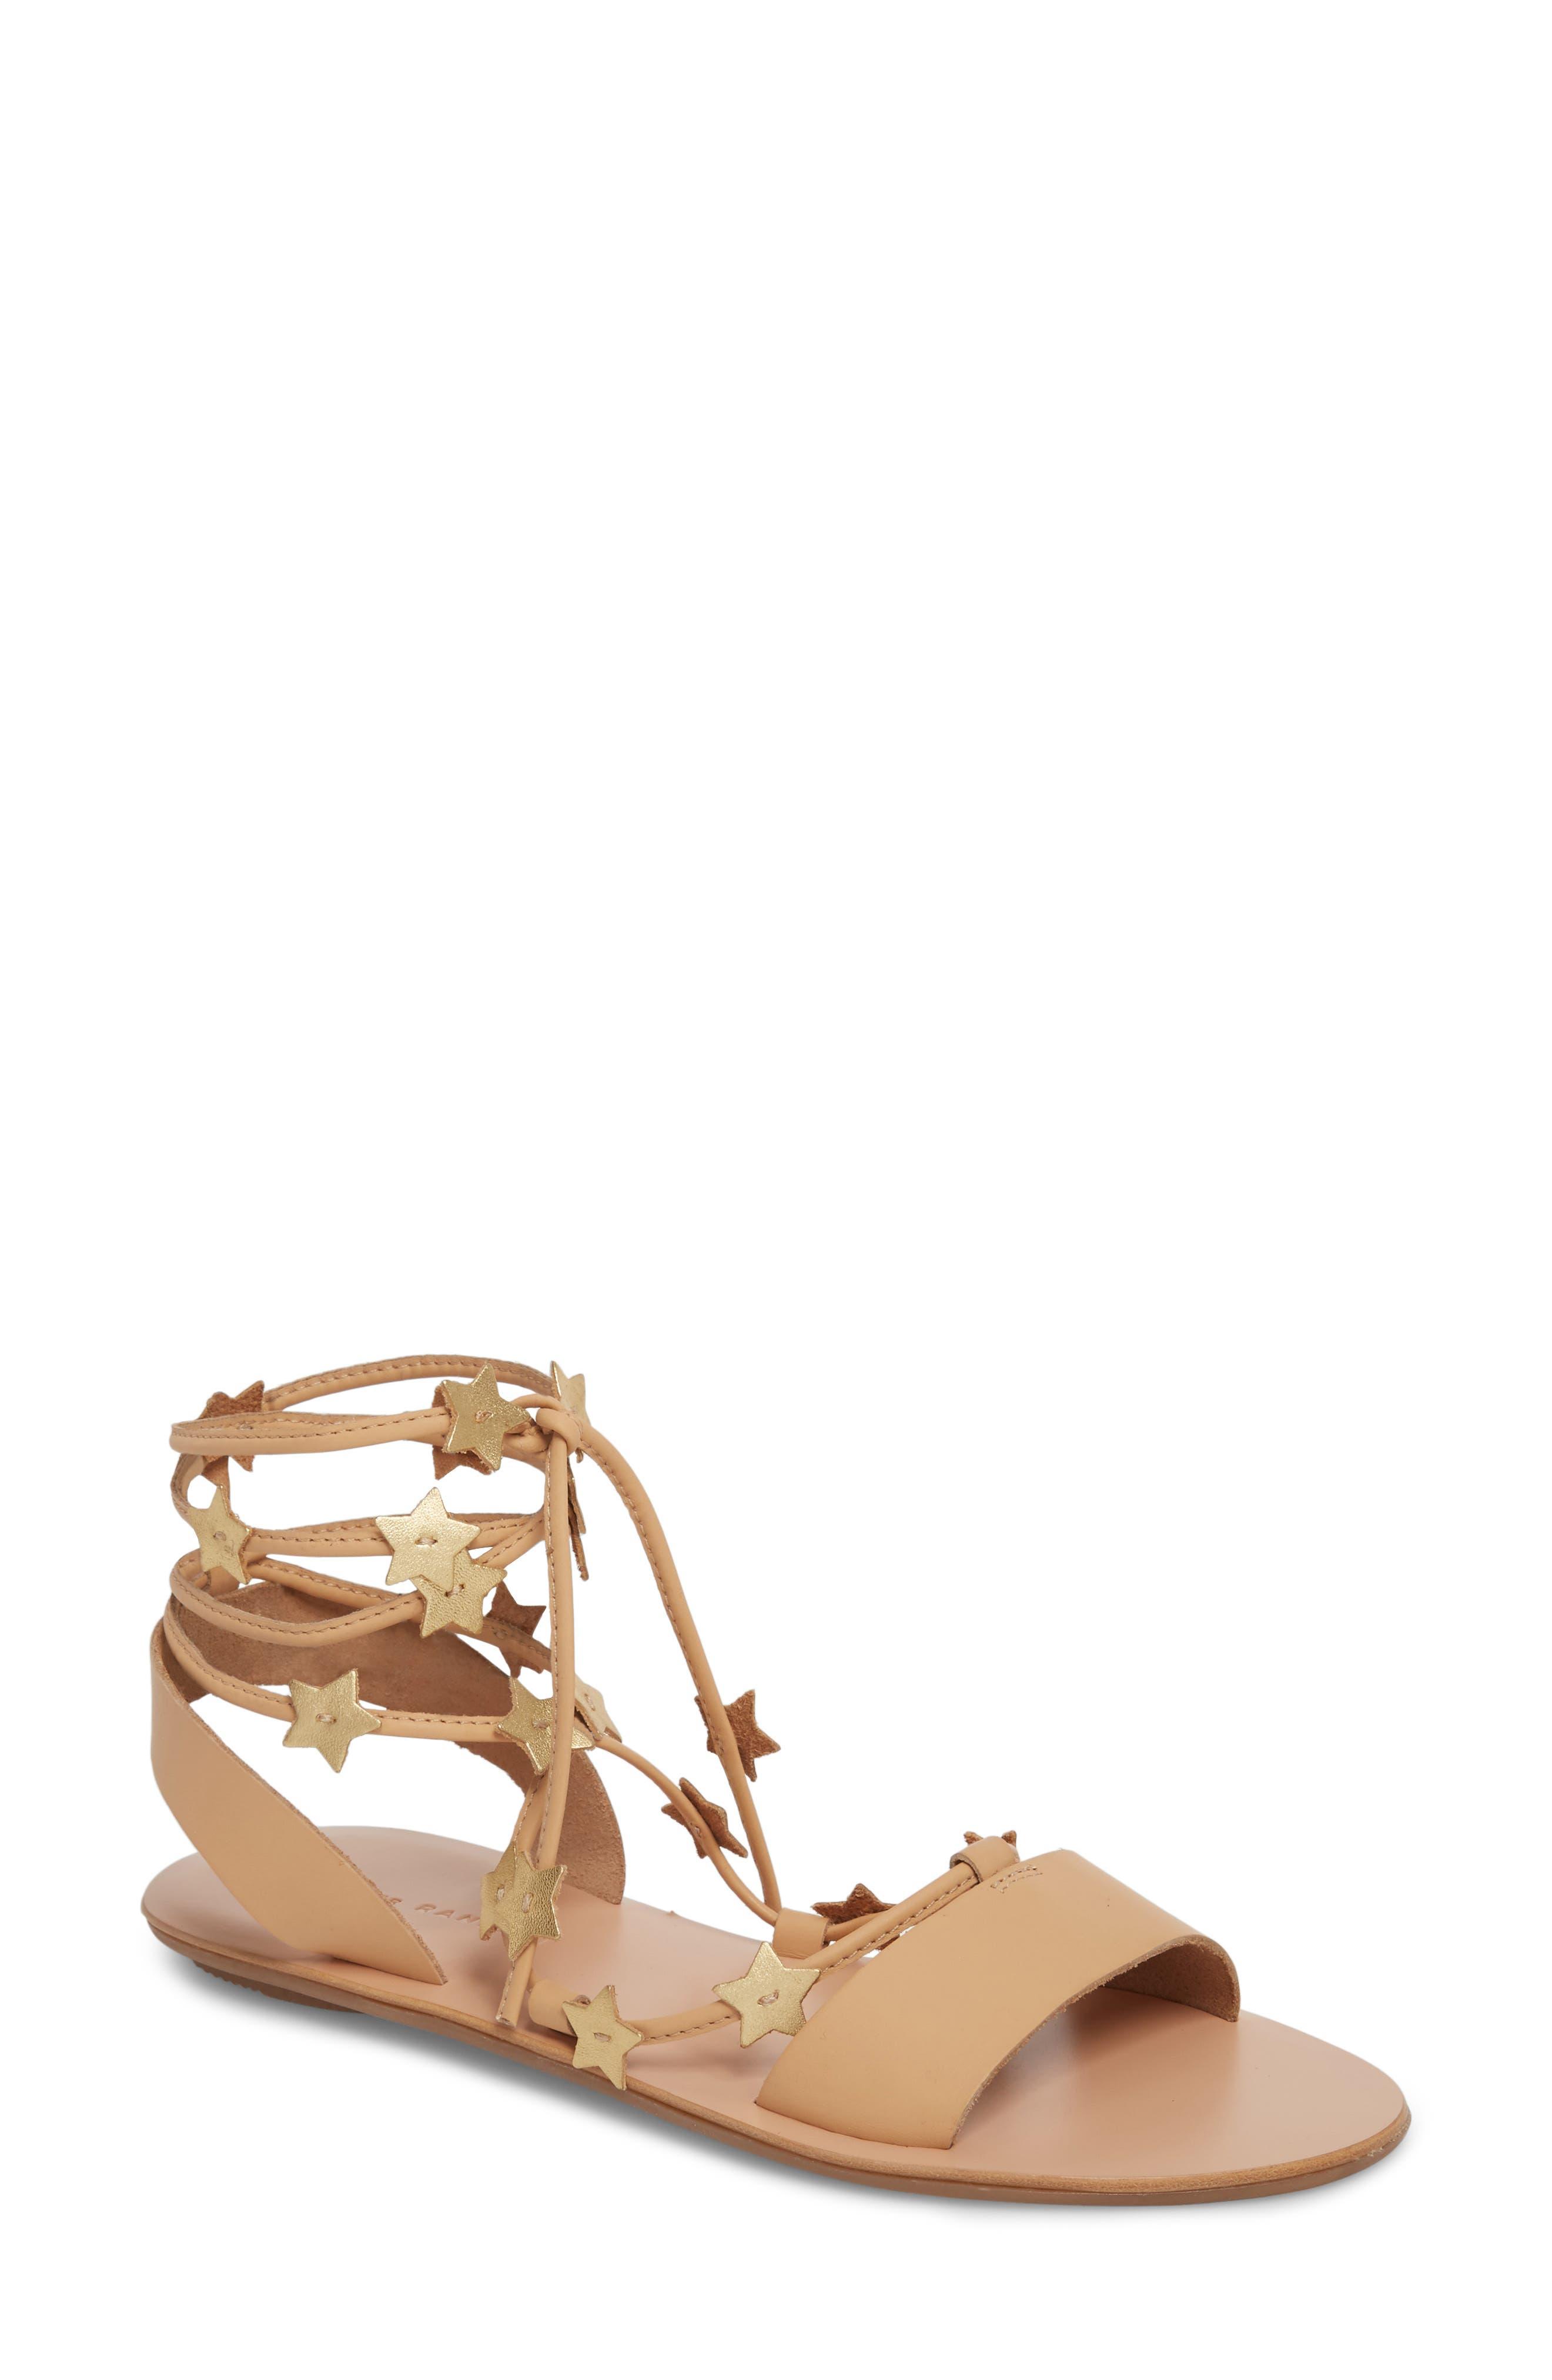 Starla Ankle Wrap Sandal,                         Main,                         color, Wheat